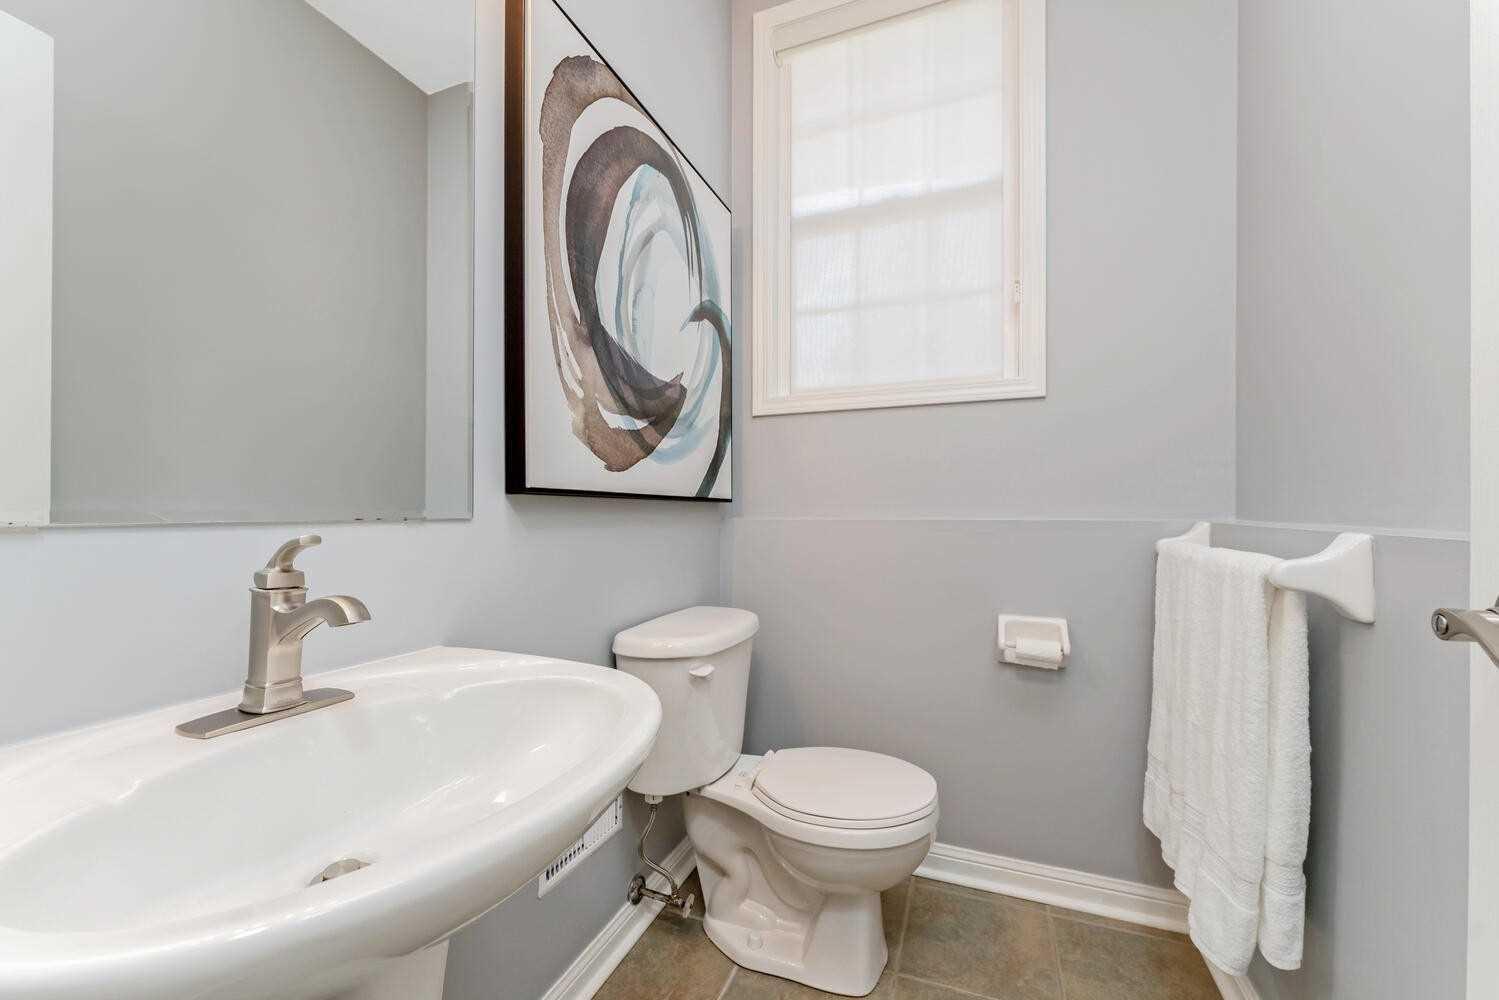 1030 Barclay Circ - Beaty Att/Row/Twnhouse for sale, 3 Bedrooms (W5400435) - #13